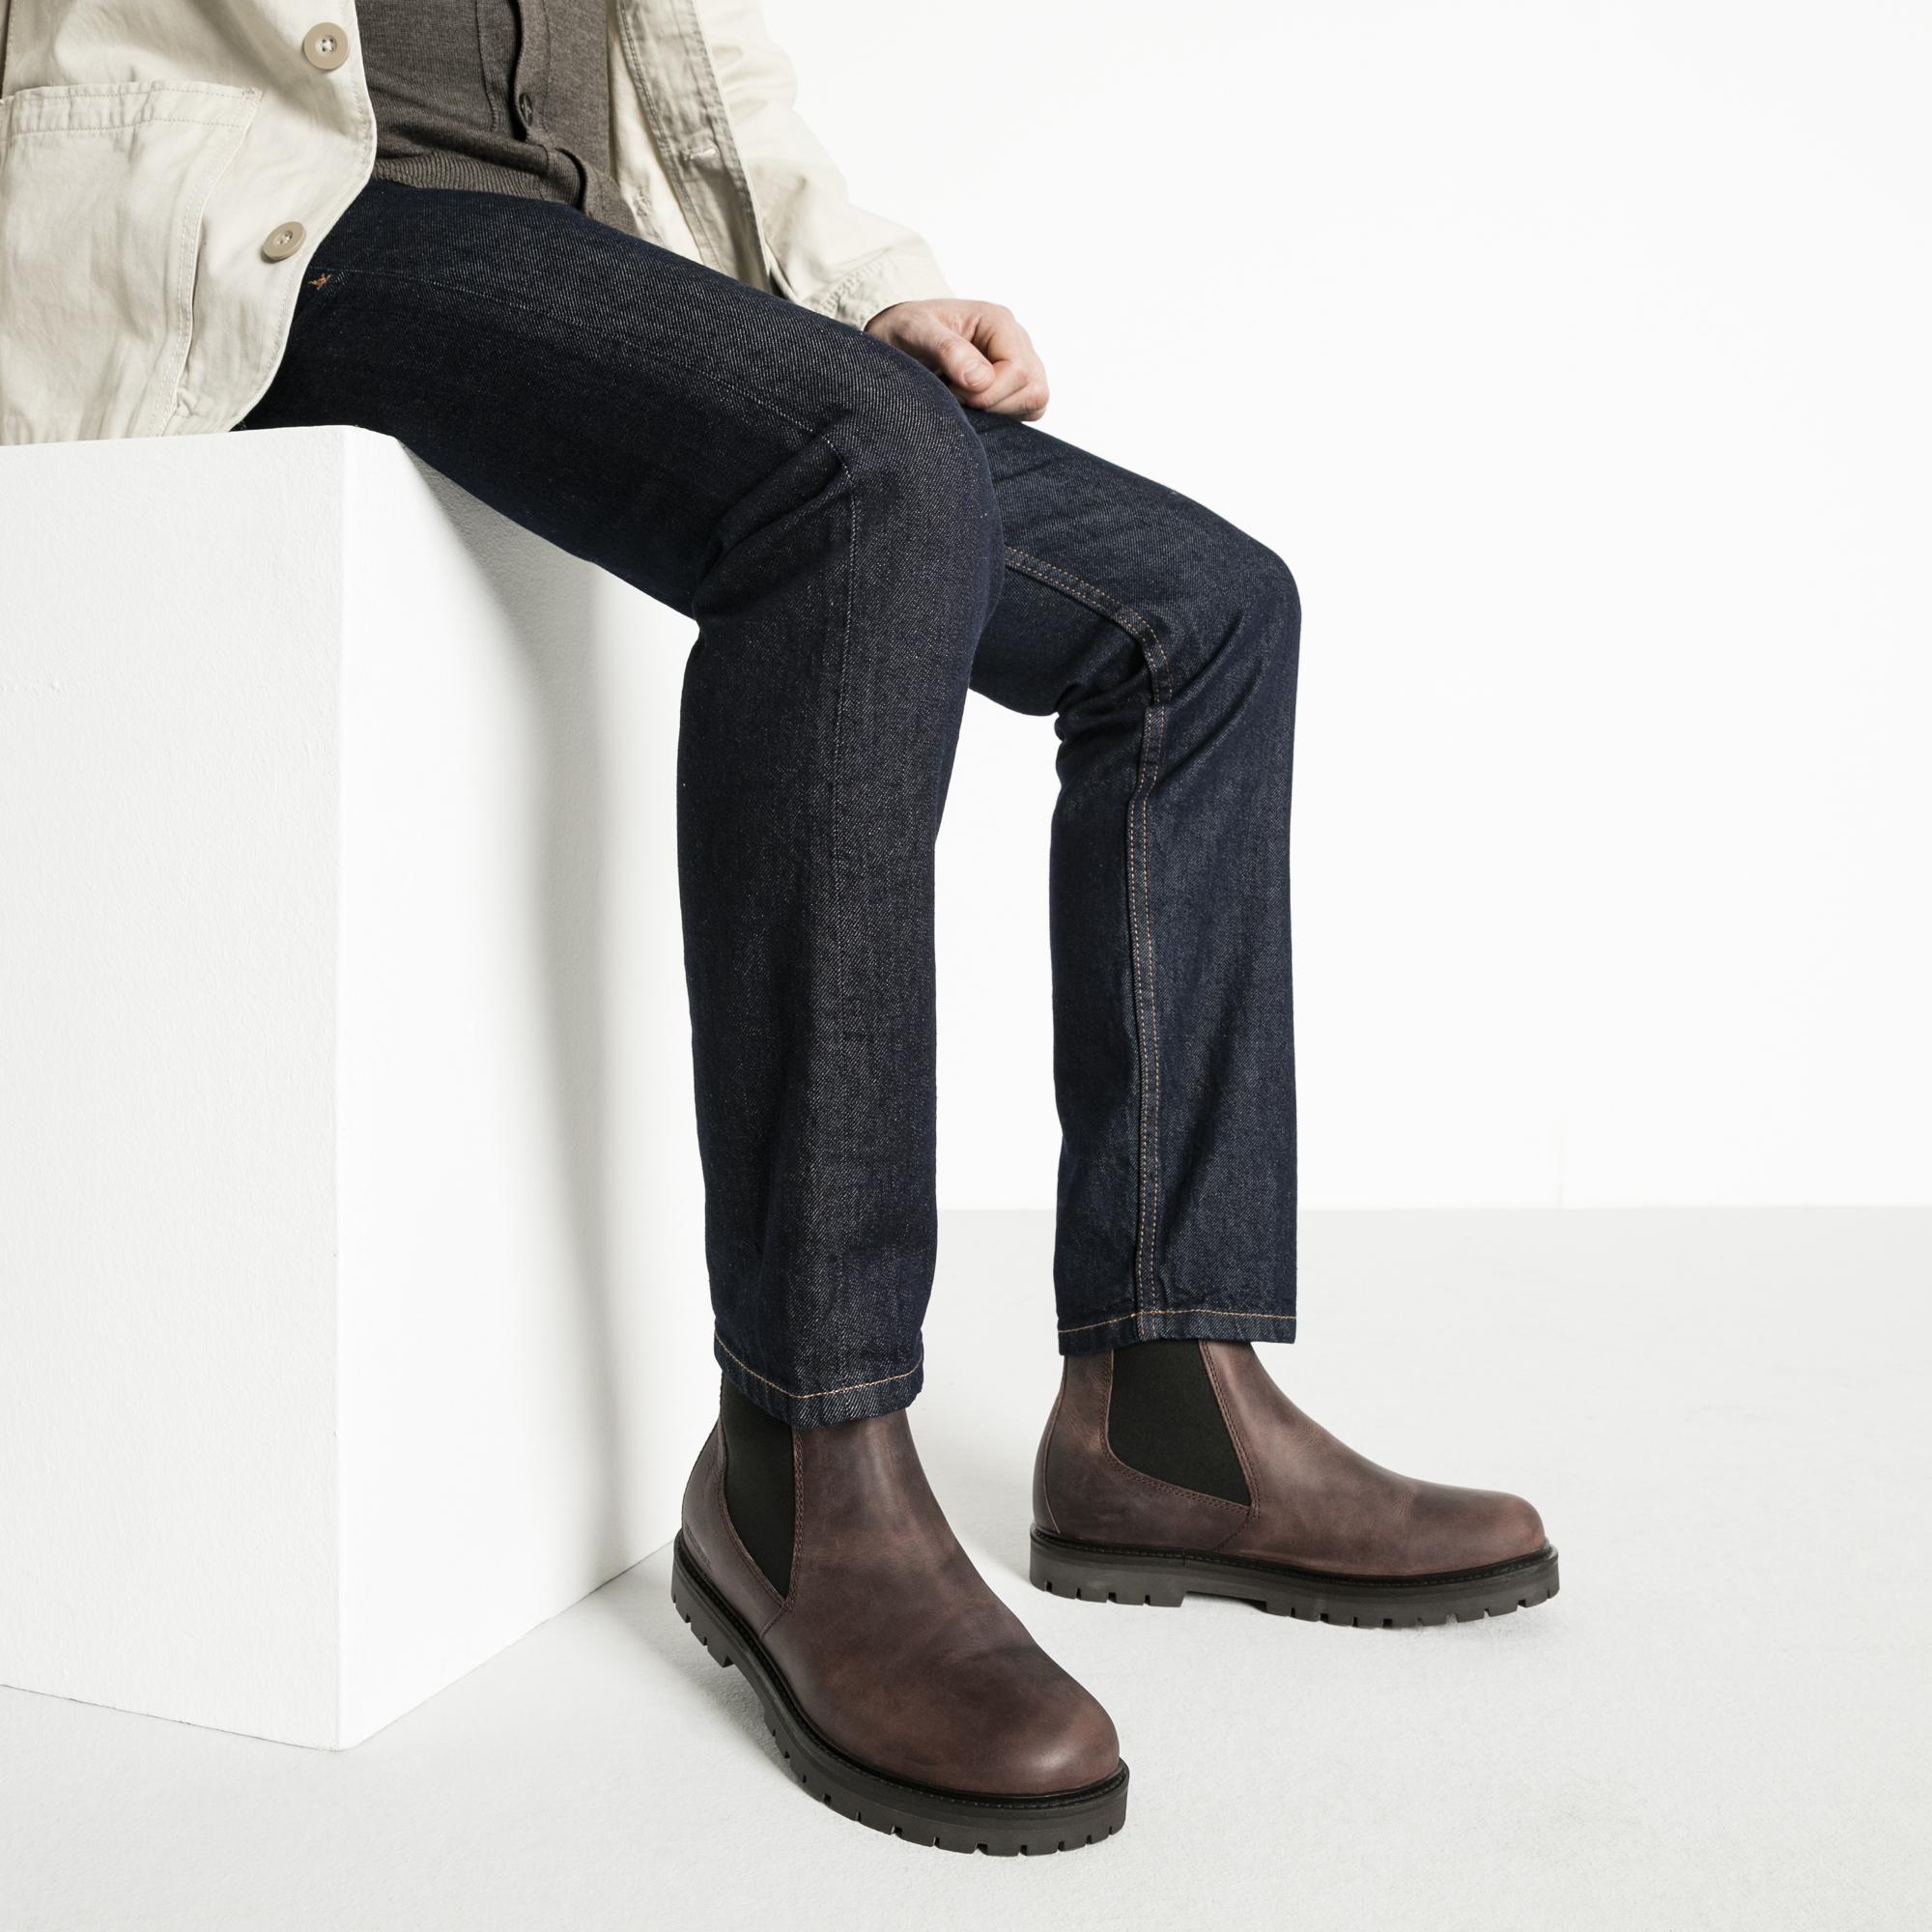 da1d97e55797 Stalon Nubuck Leather Mocha | shop online at BIRKENSTOCK